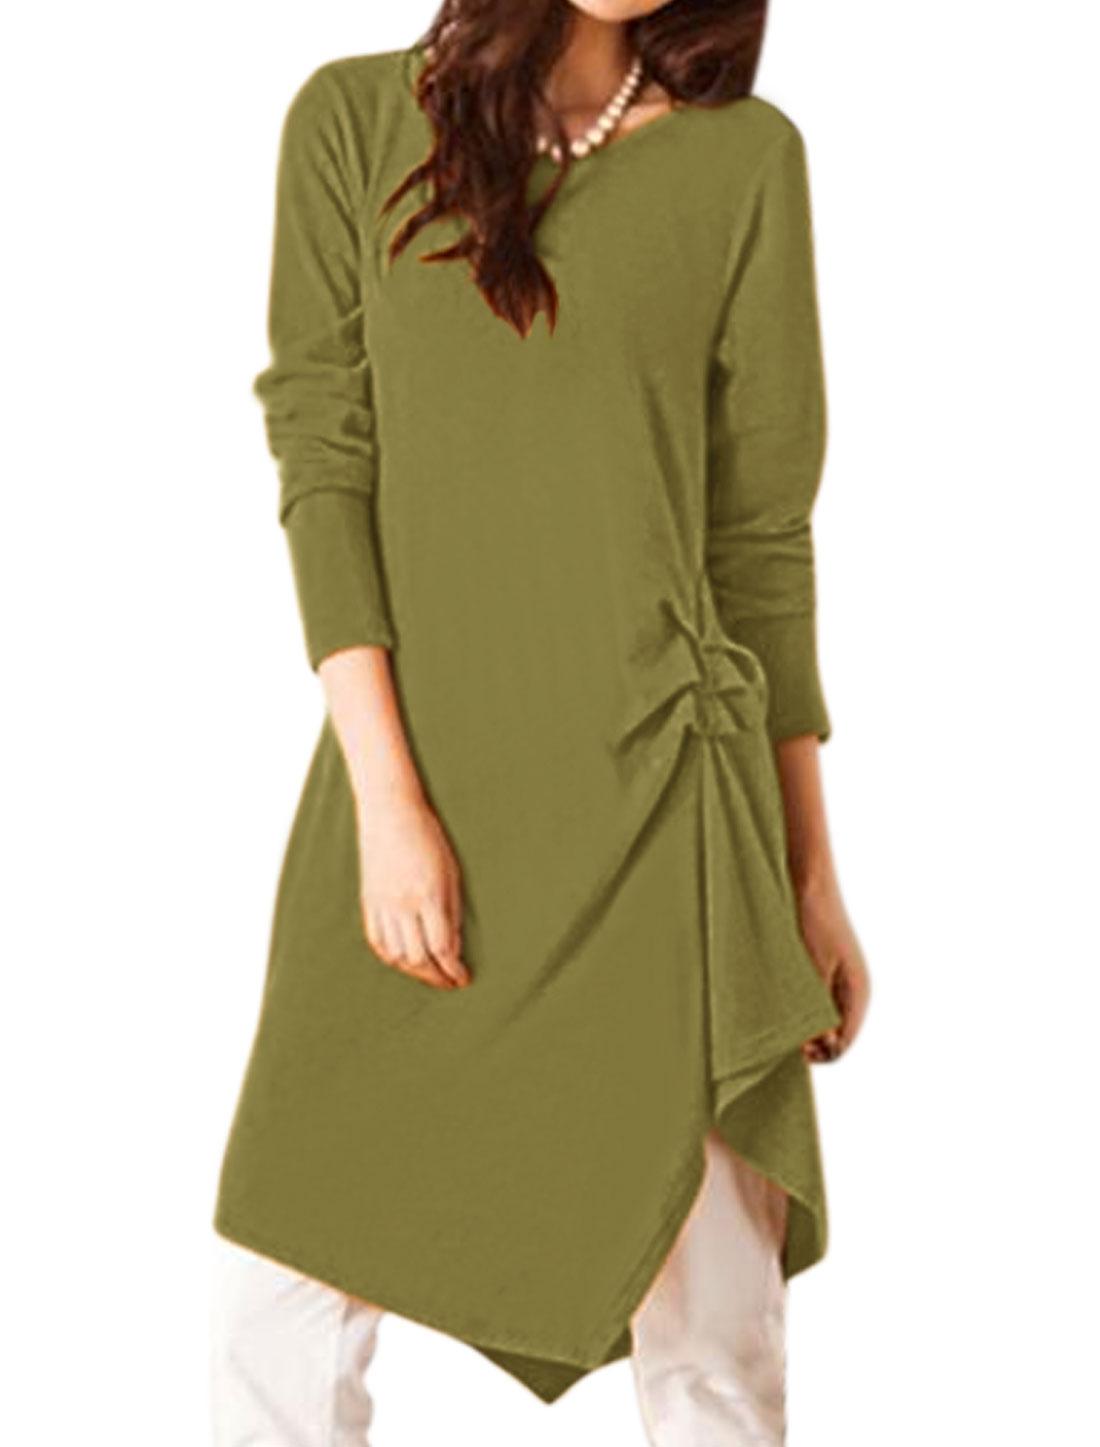 Women Long Sleeves Ruched Side Irregular Hem Tunic Dress Green XS